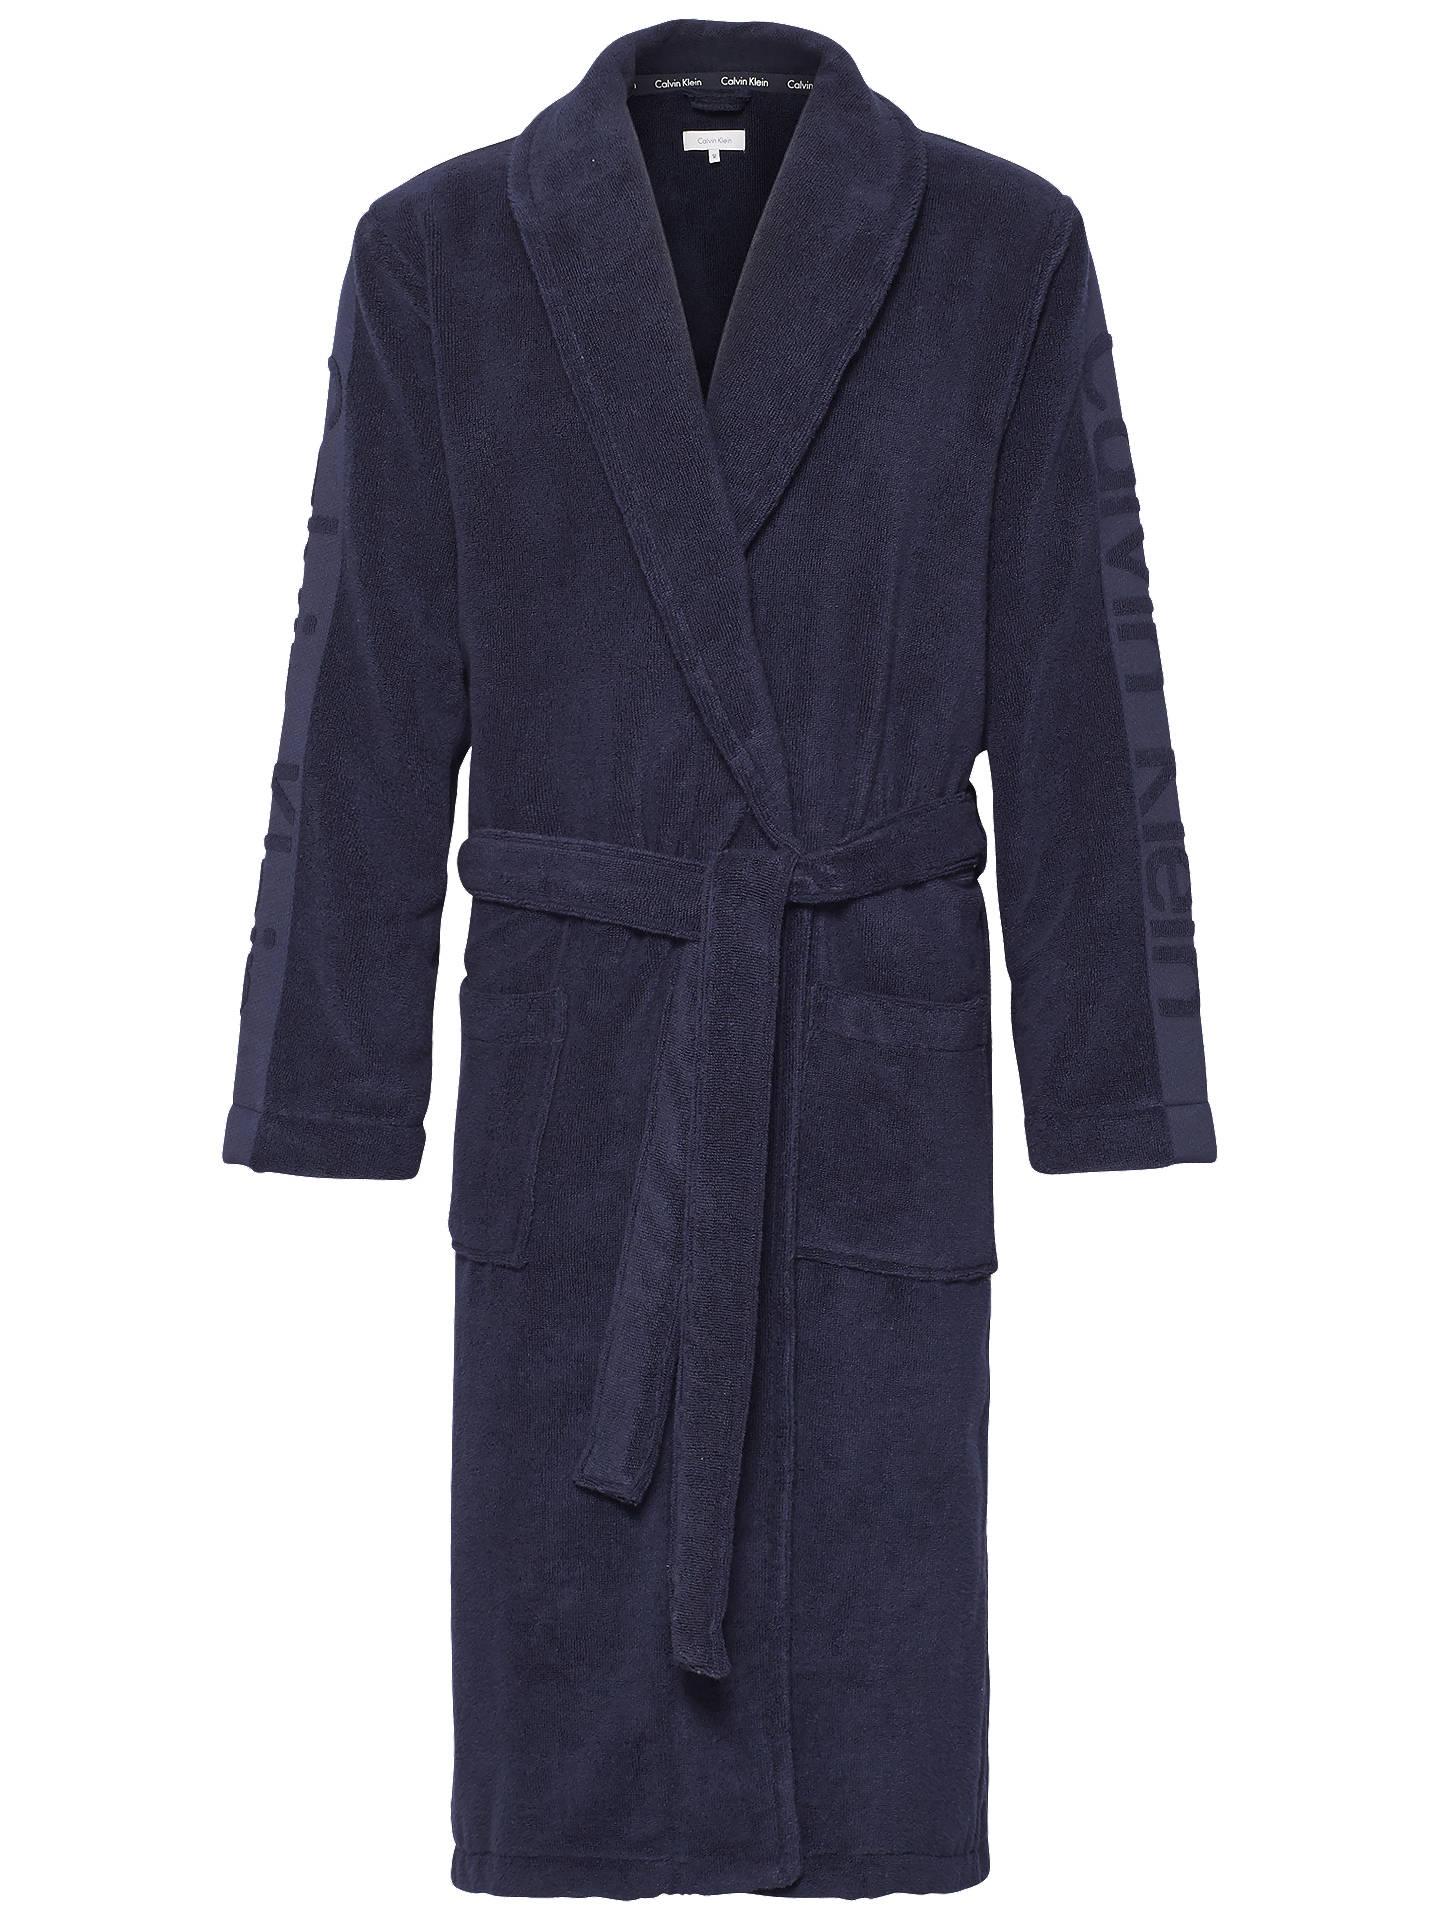 Calvin Klein Cotton Wrap Dressing Gown, Navy at John Lewis & Partners